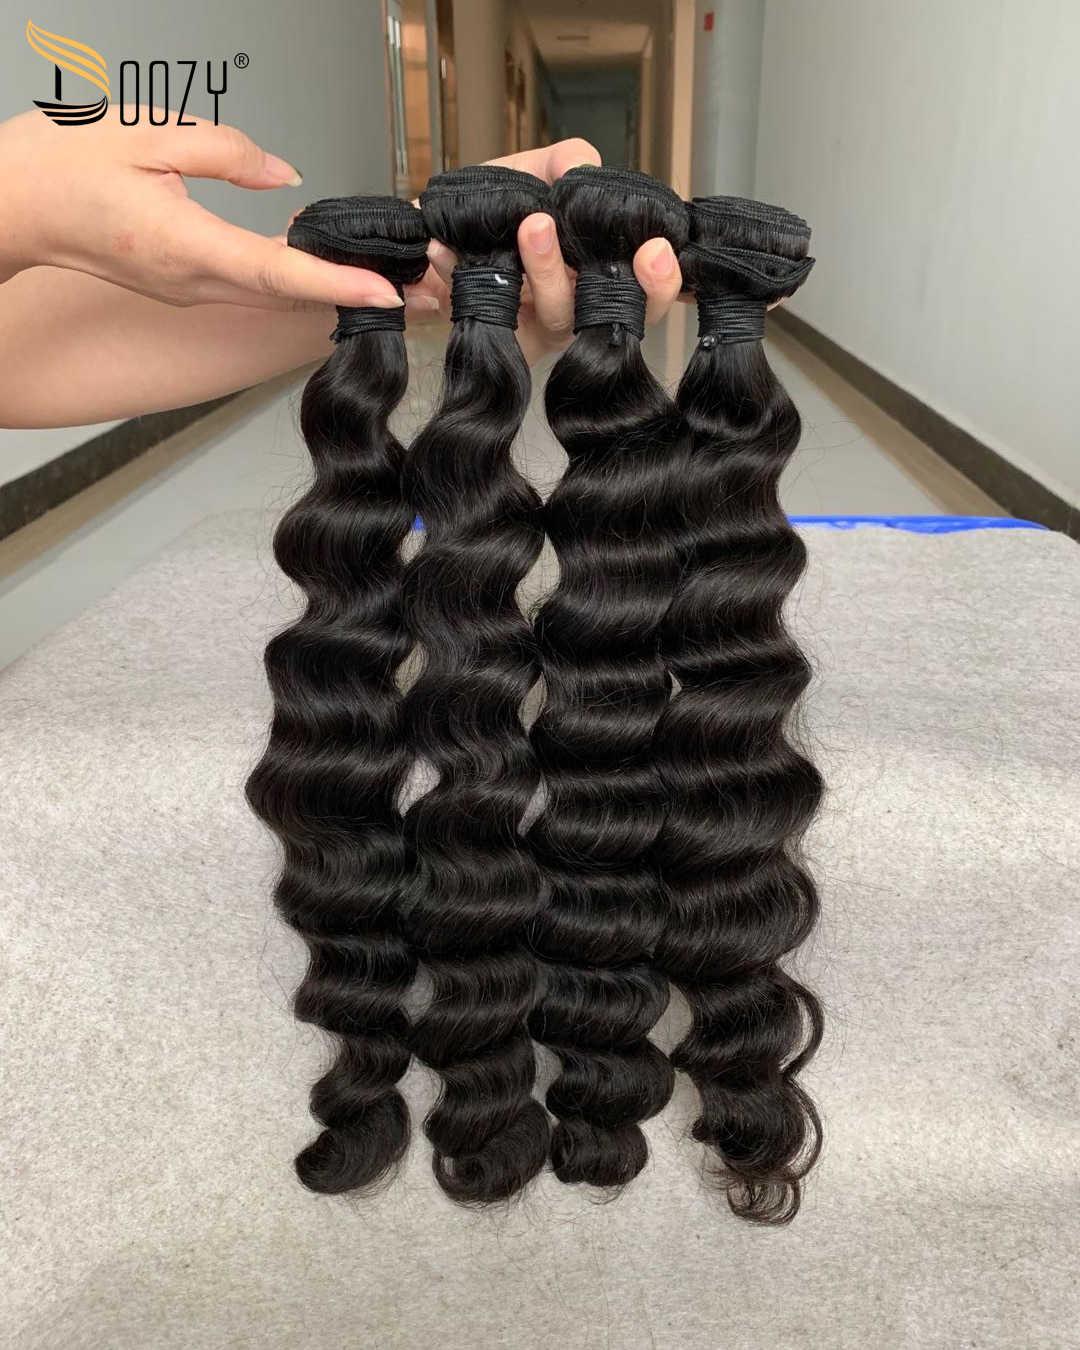 Doozy suelta pelo virgen brasileño profundo 3 paquetes de Color Natural 10A cabello humano virgen